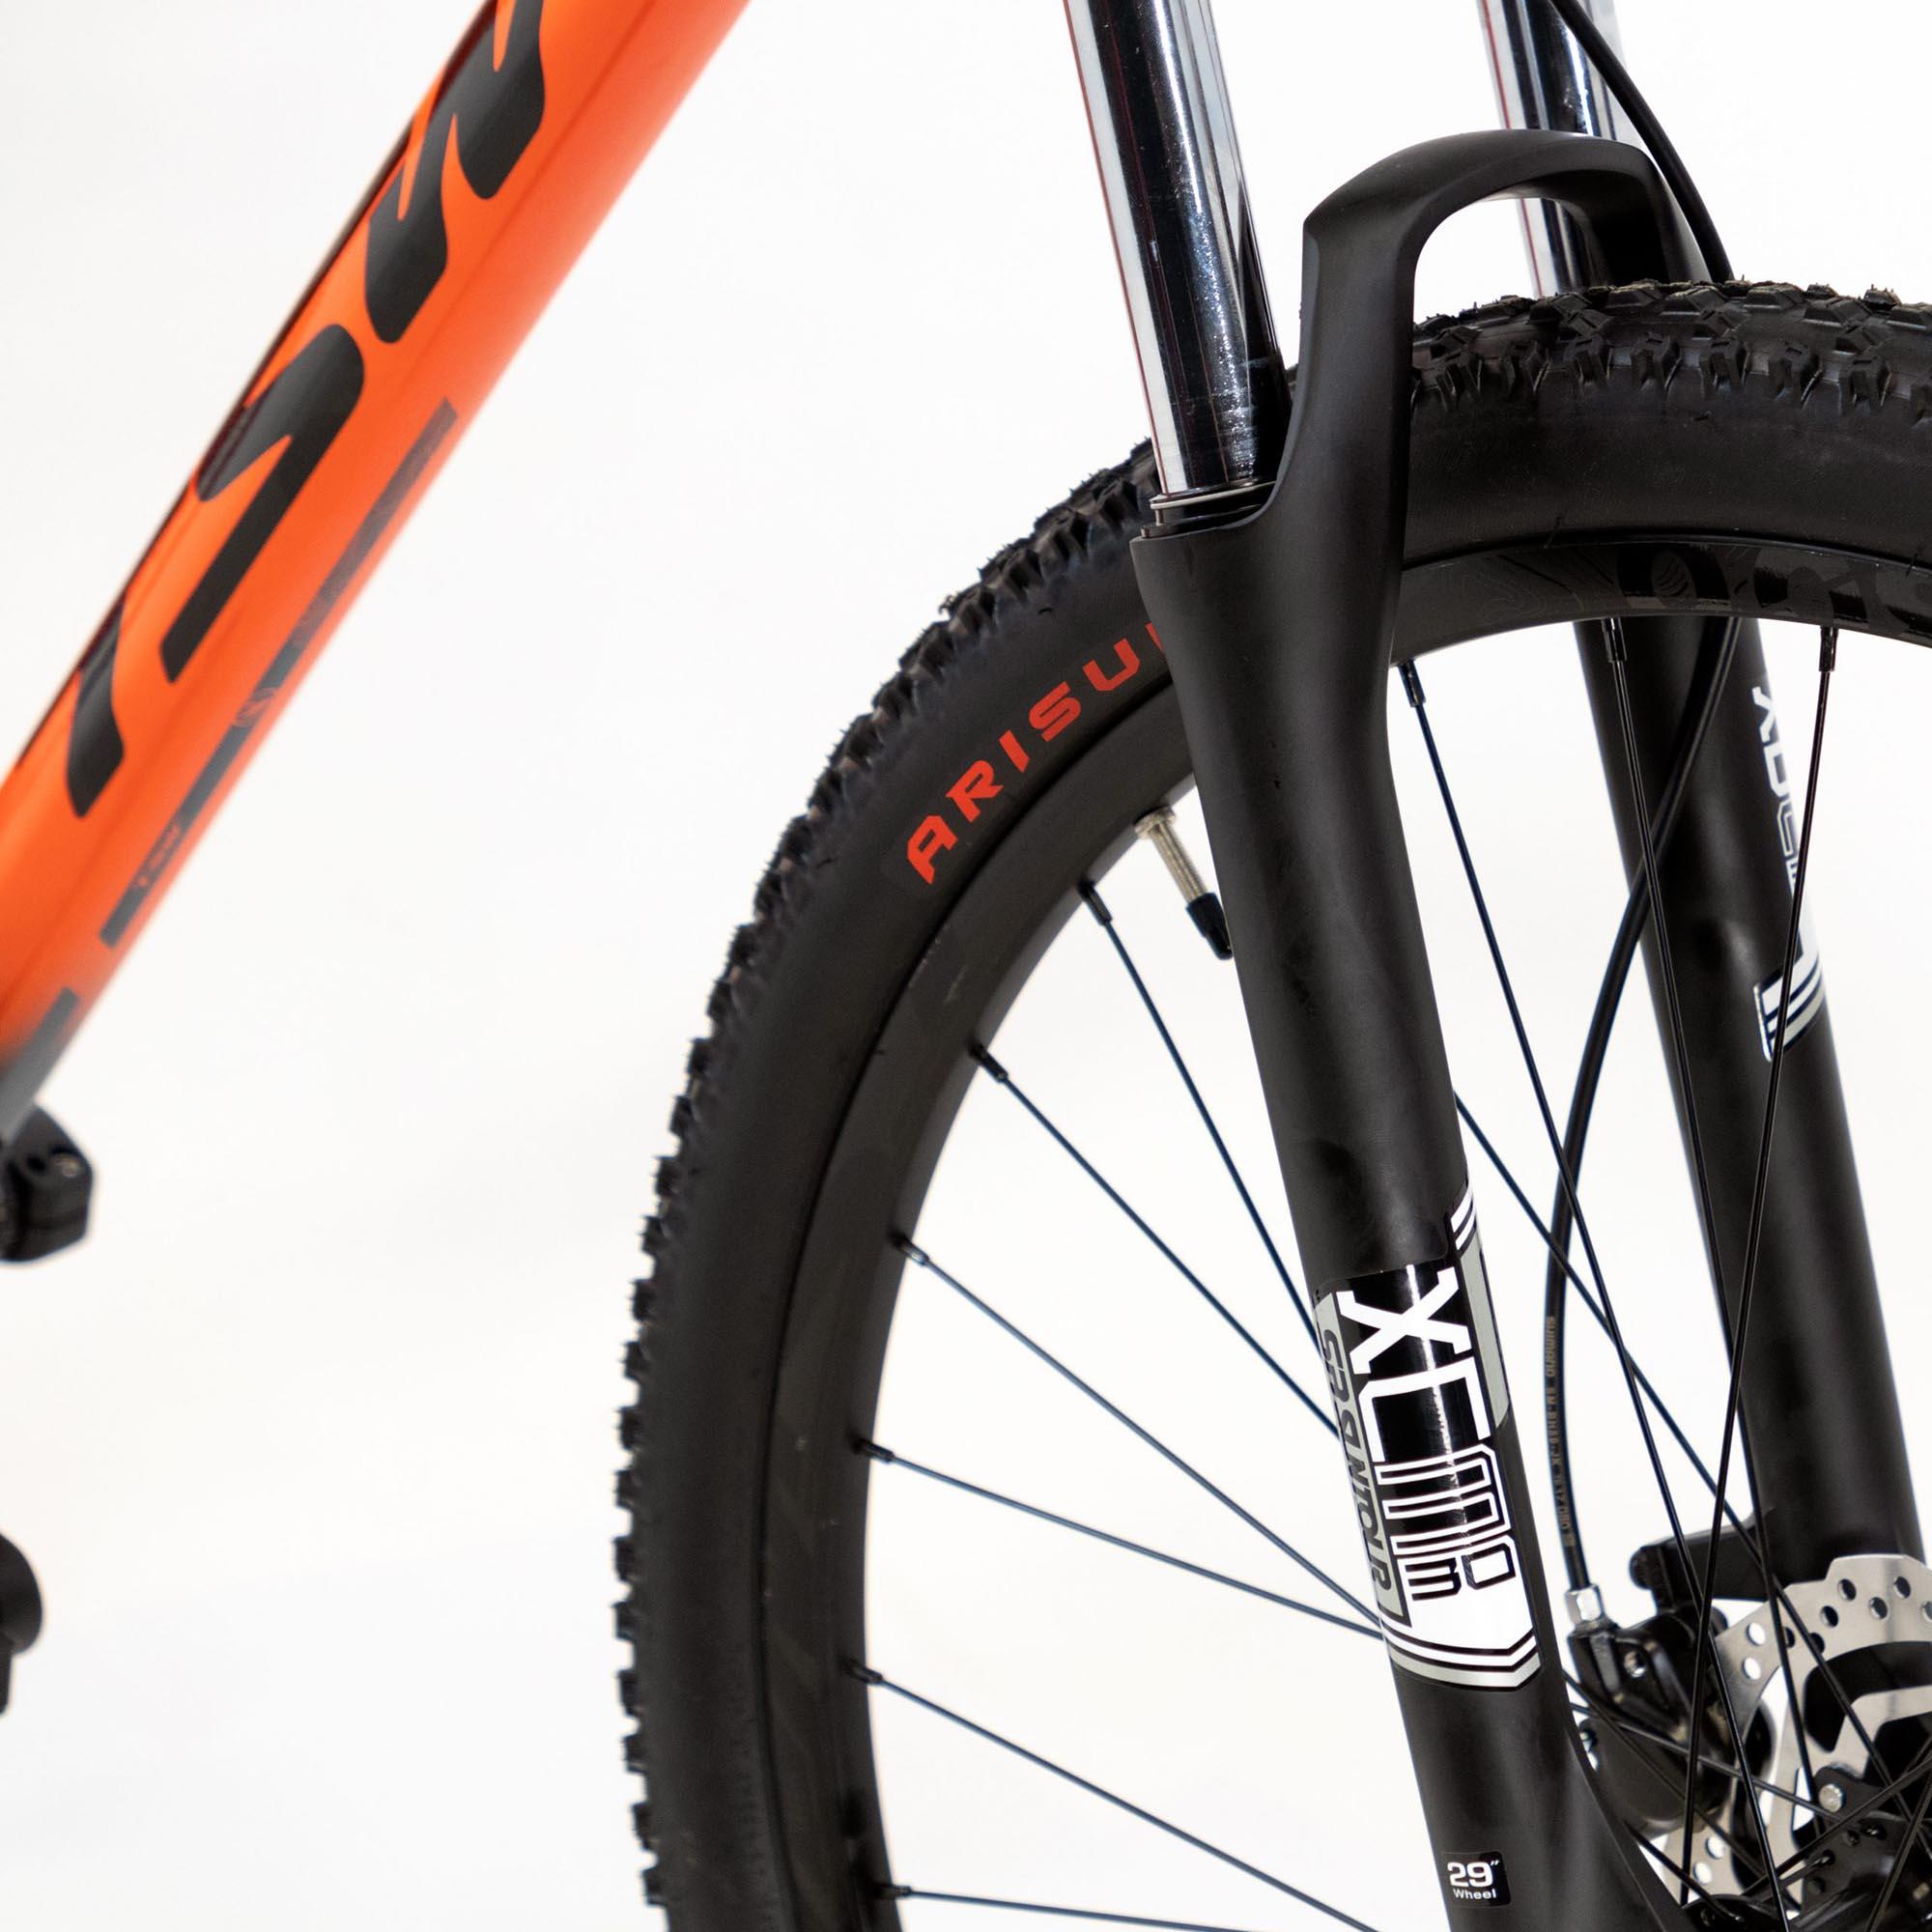 Bicicleta Aro 29 TSW Stamina Shimano Alivio, Suspensão Suntour XCM 30, Freio Shimano